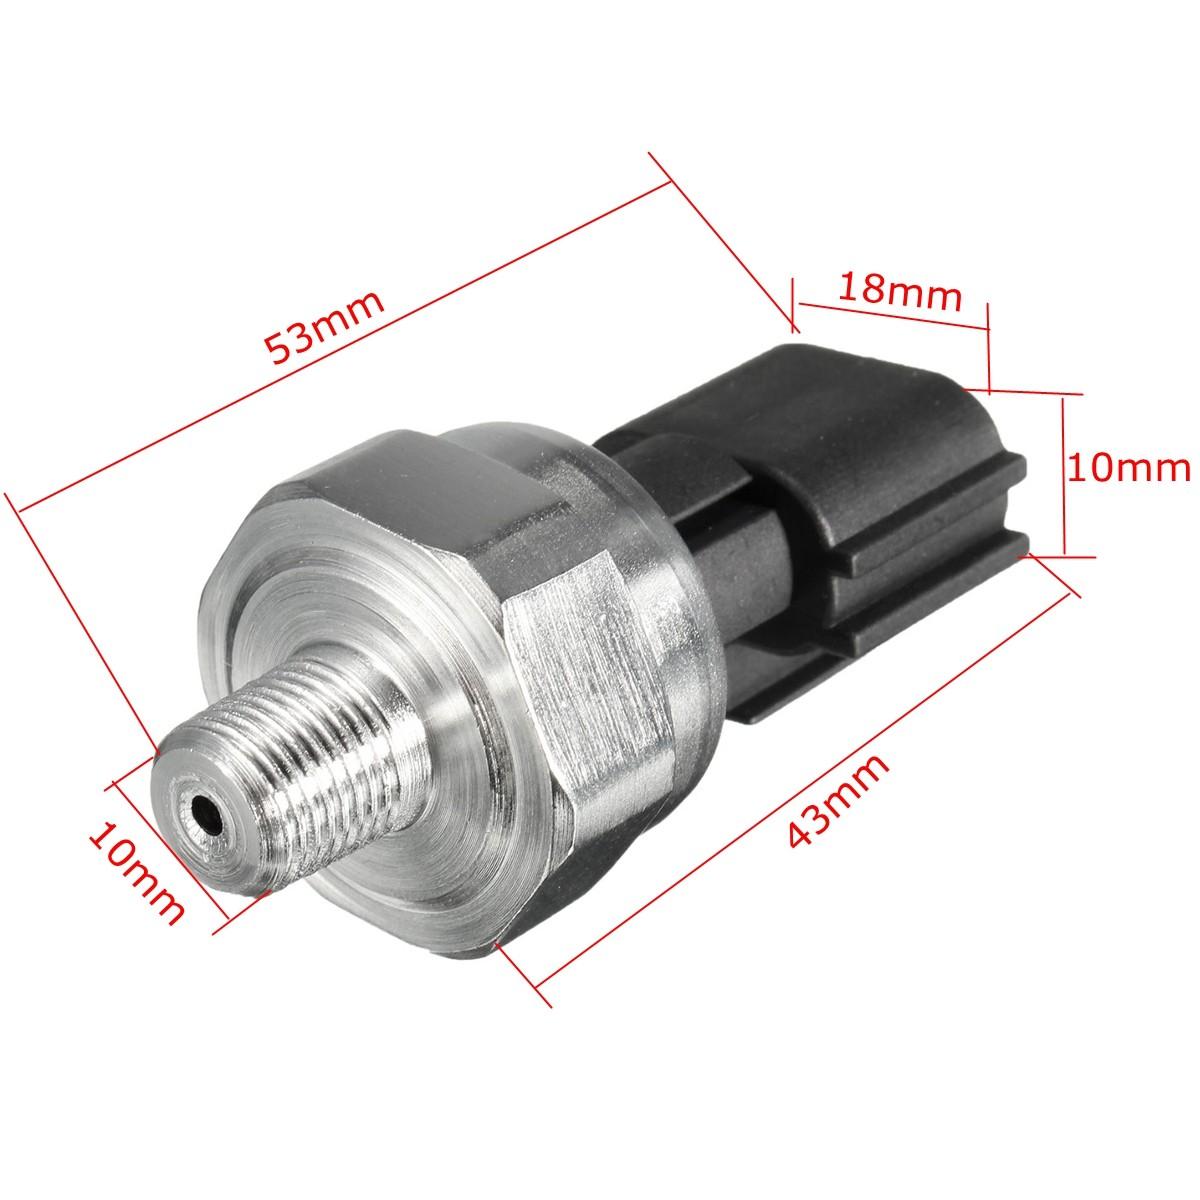 2008 Nissan Xterra Instrument Panel Lights: #25070-CD000 Oil Pressure Sender Light & Gauge / Switch